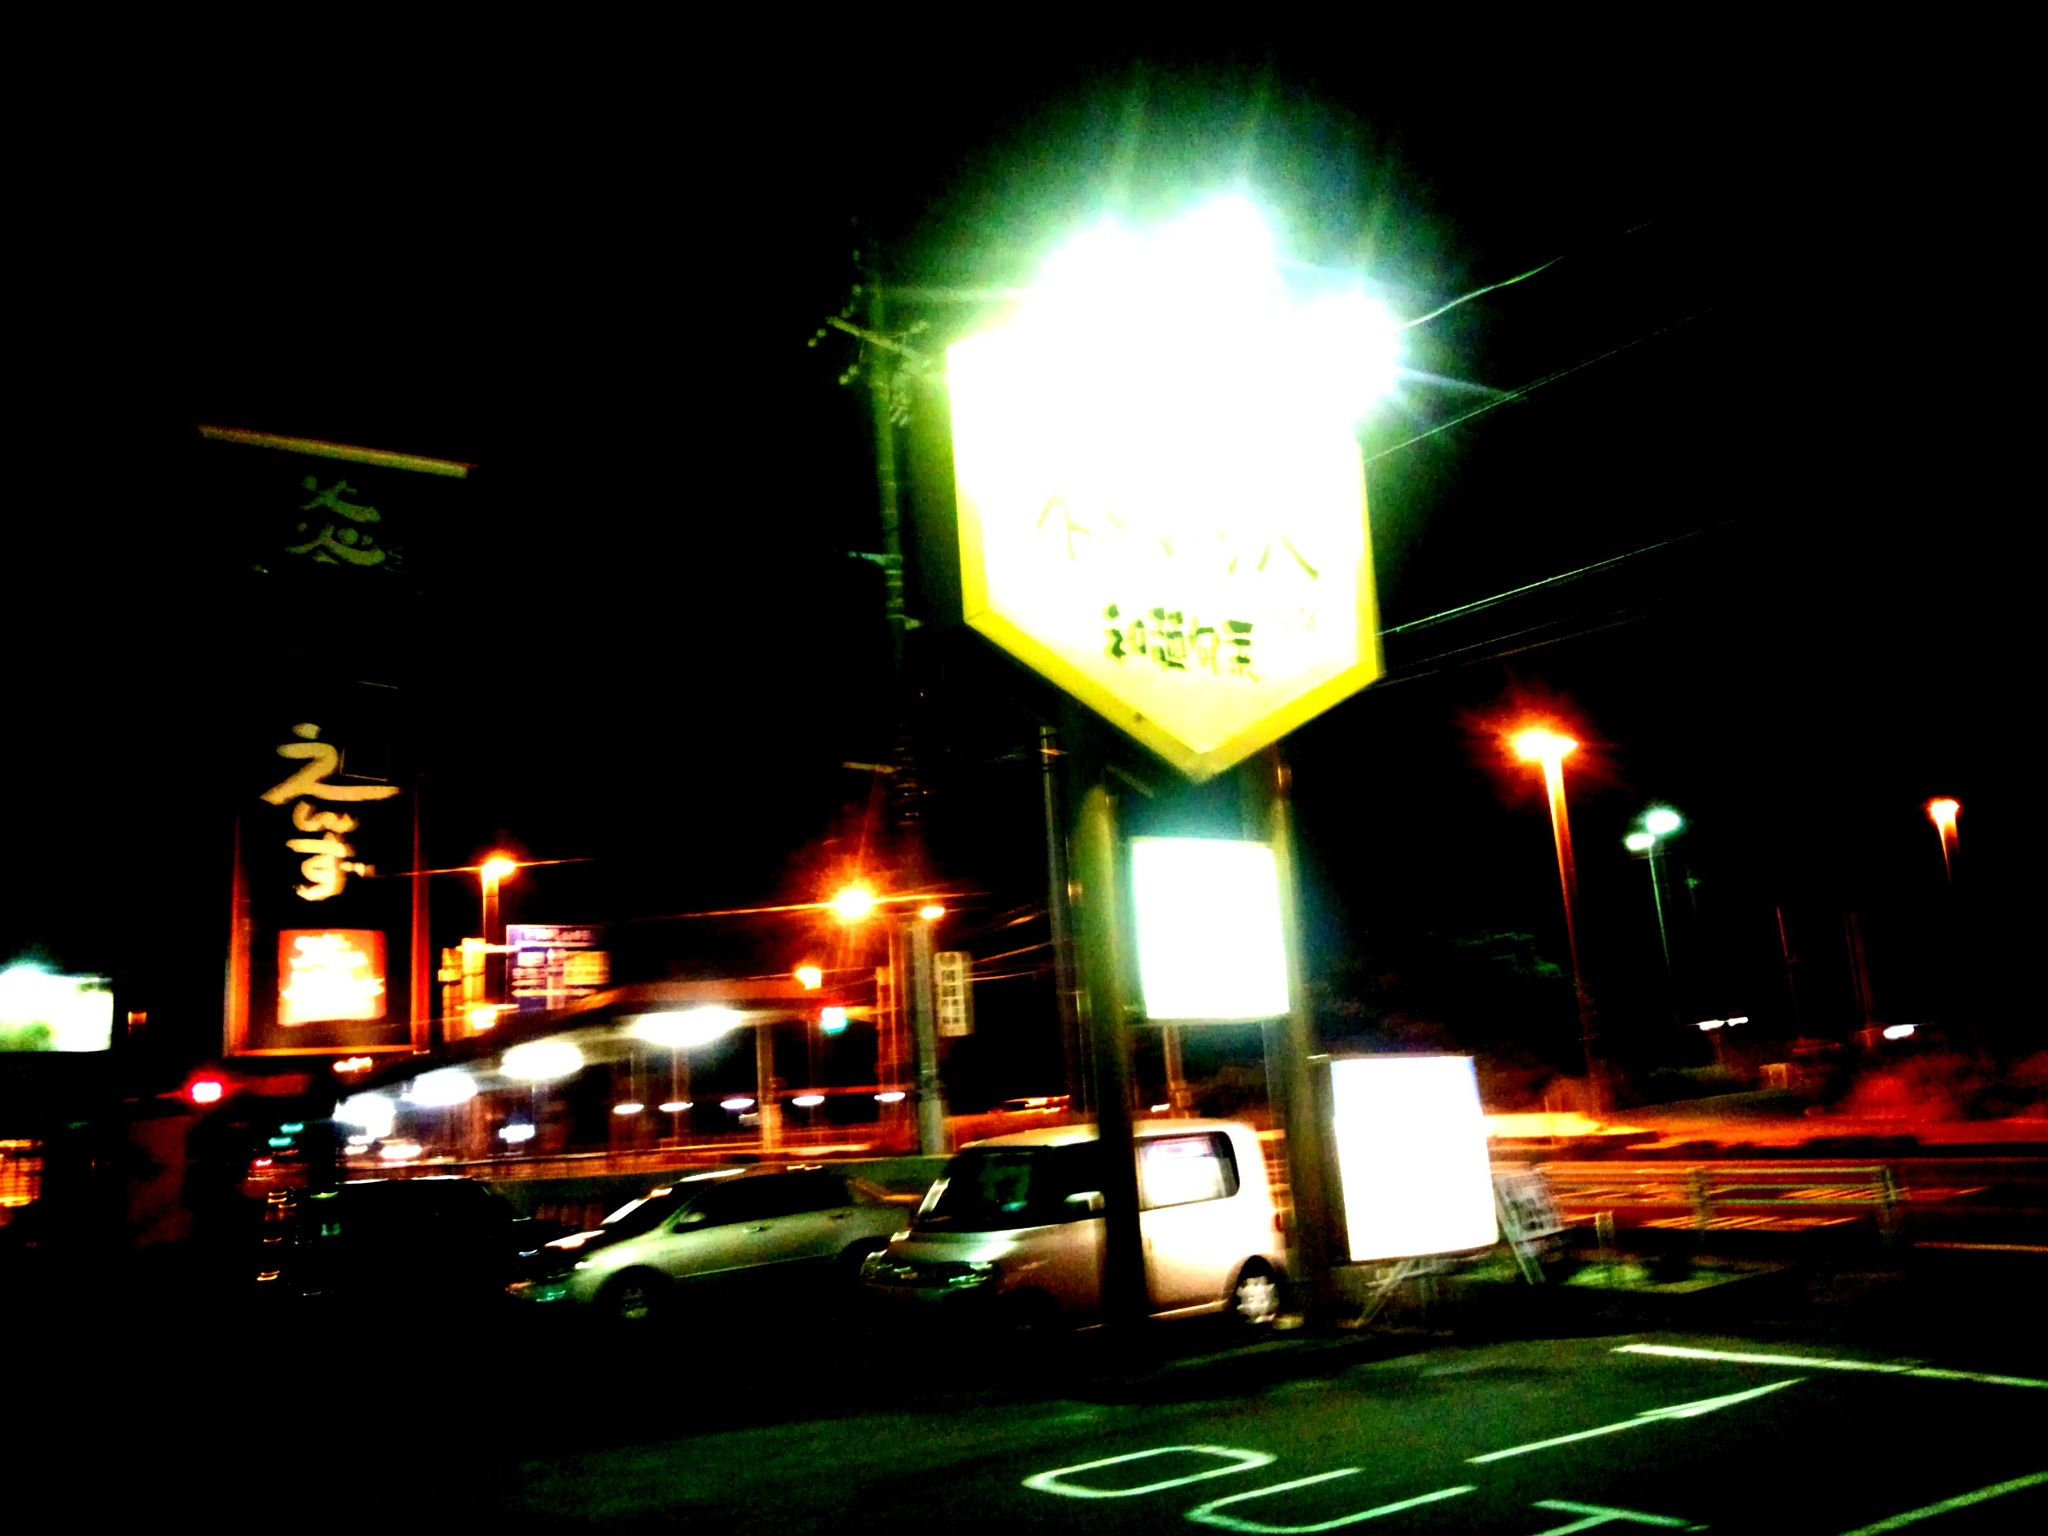 street_R190 by takuya.murata.14